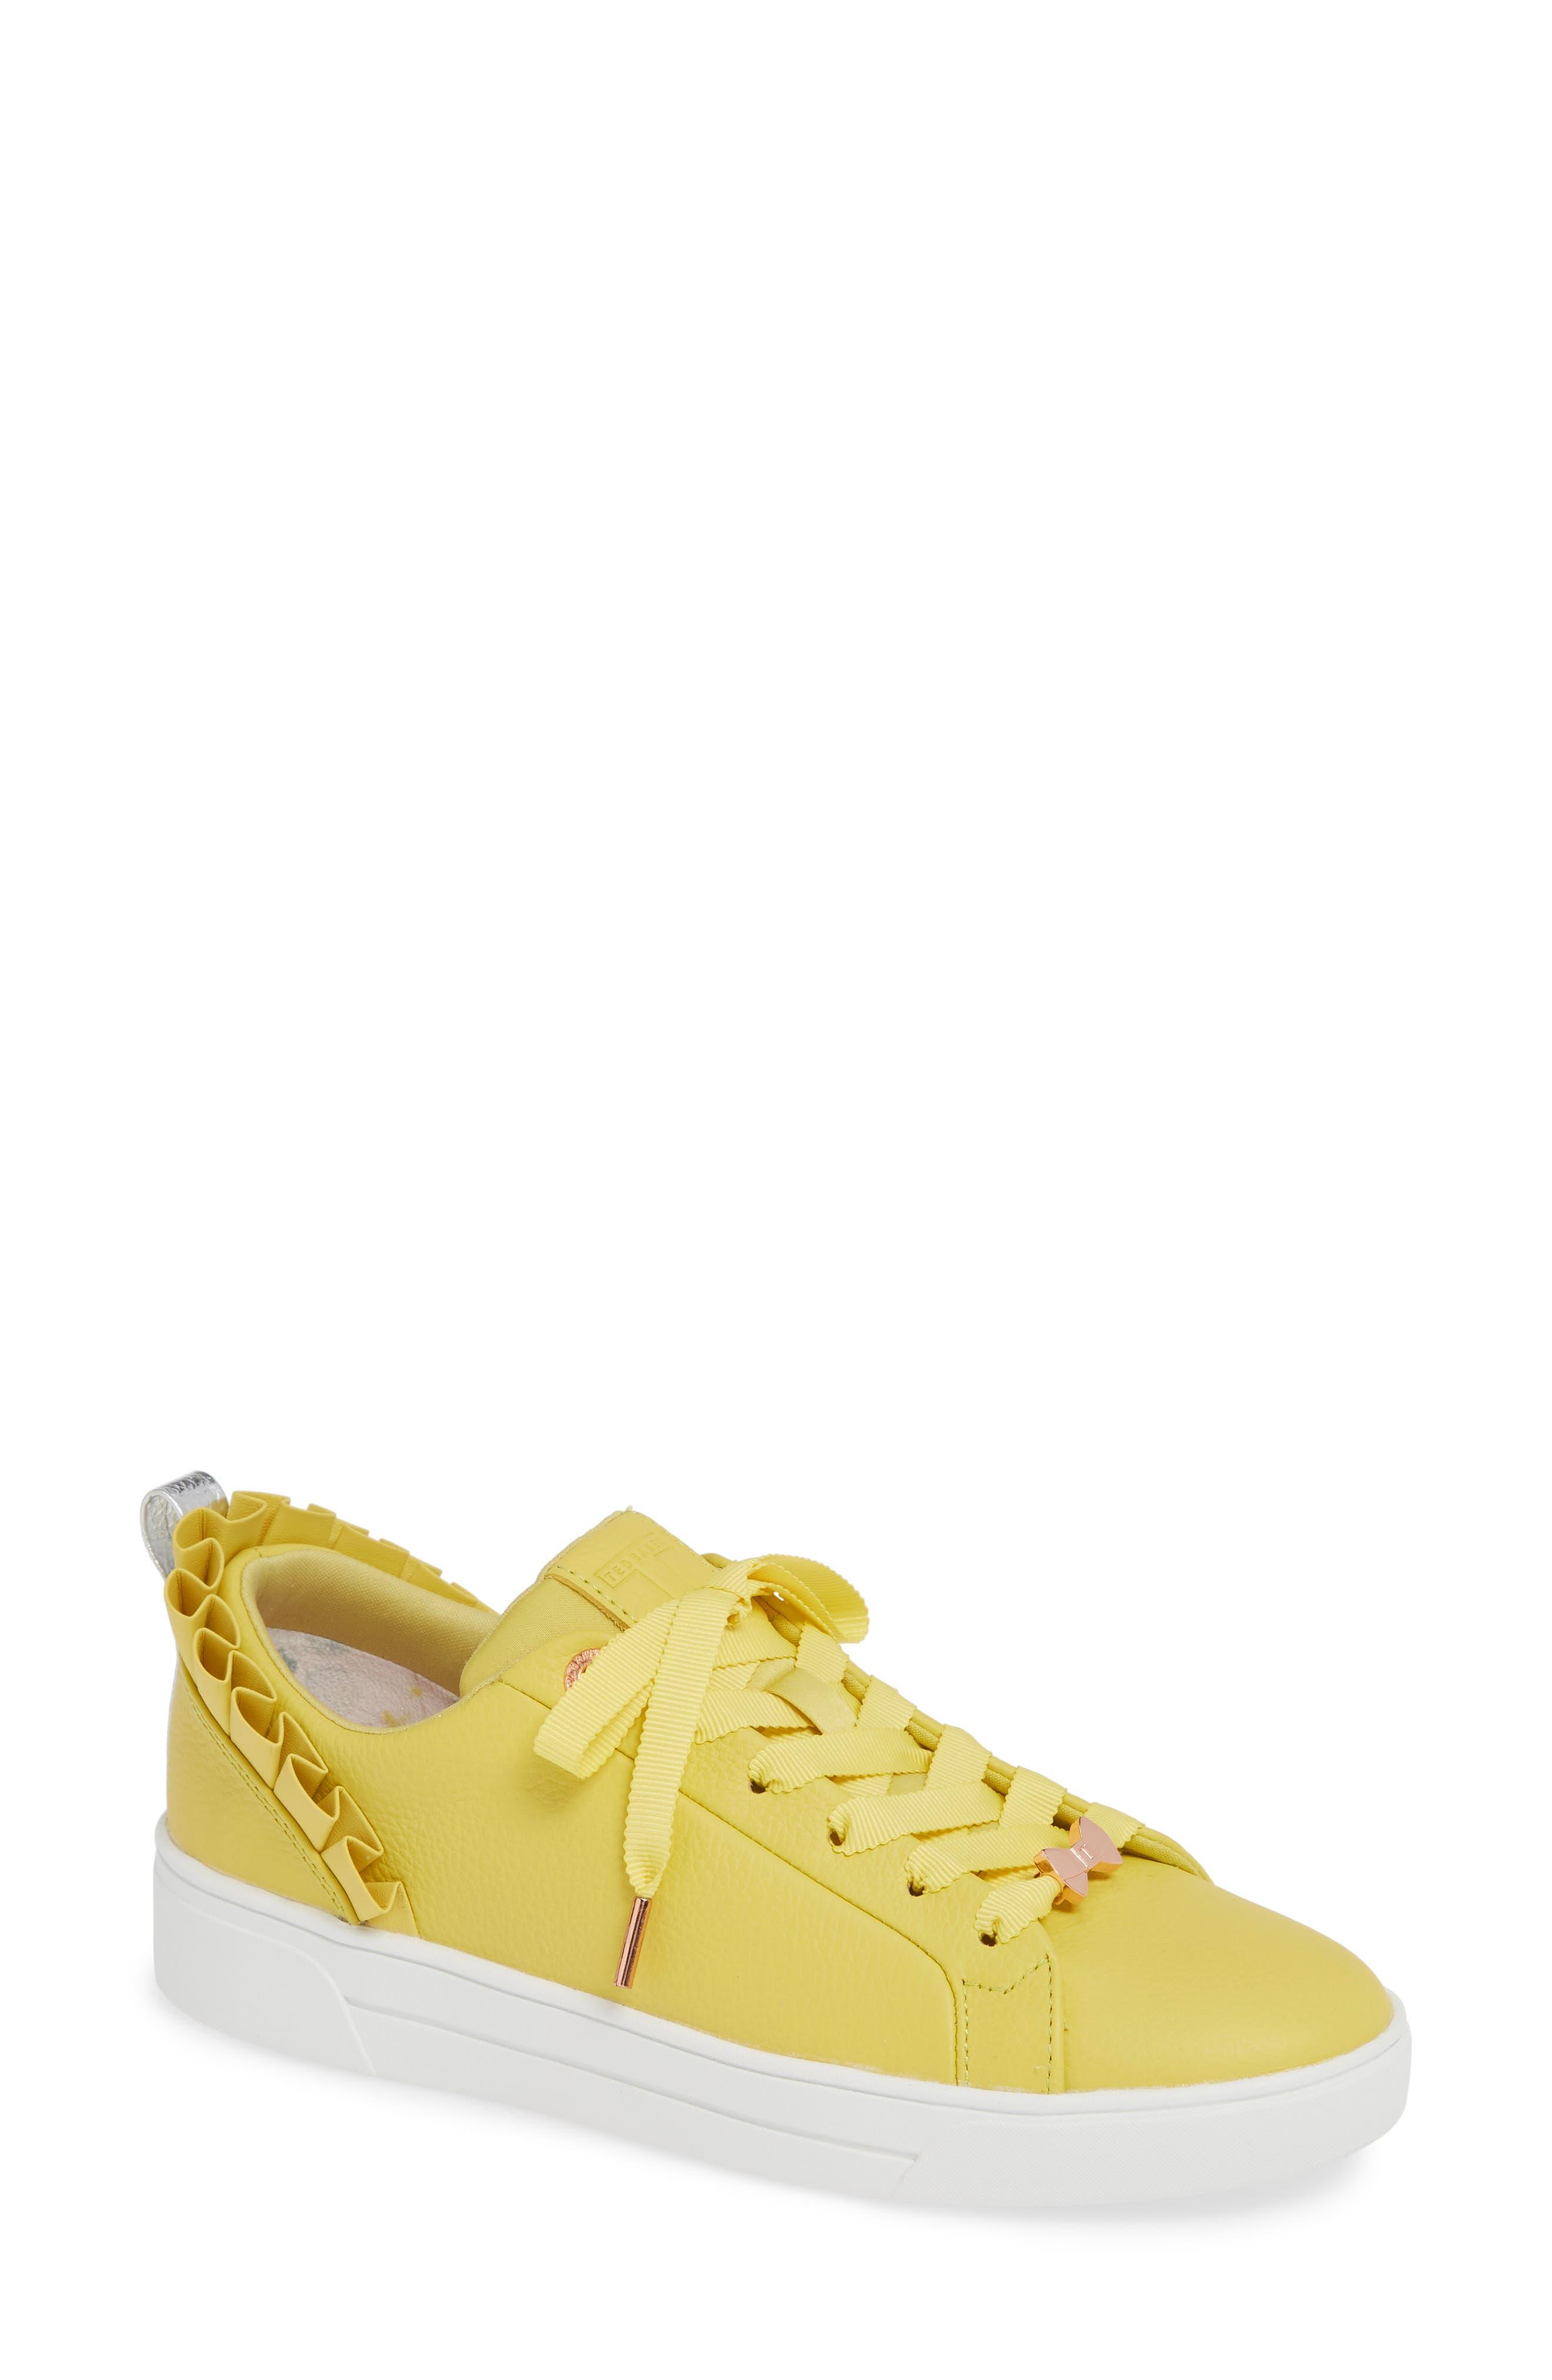 Ted Baker London Astrina Sneaker, Yellow